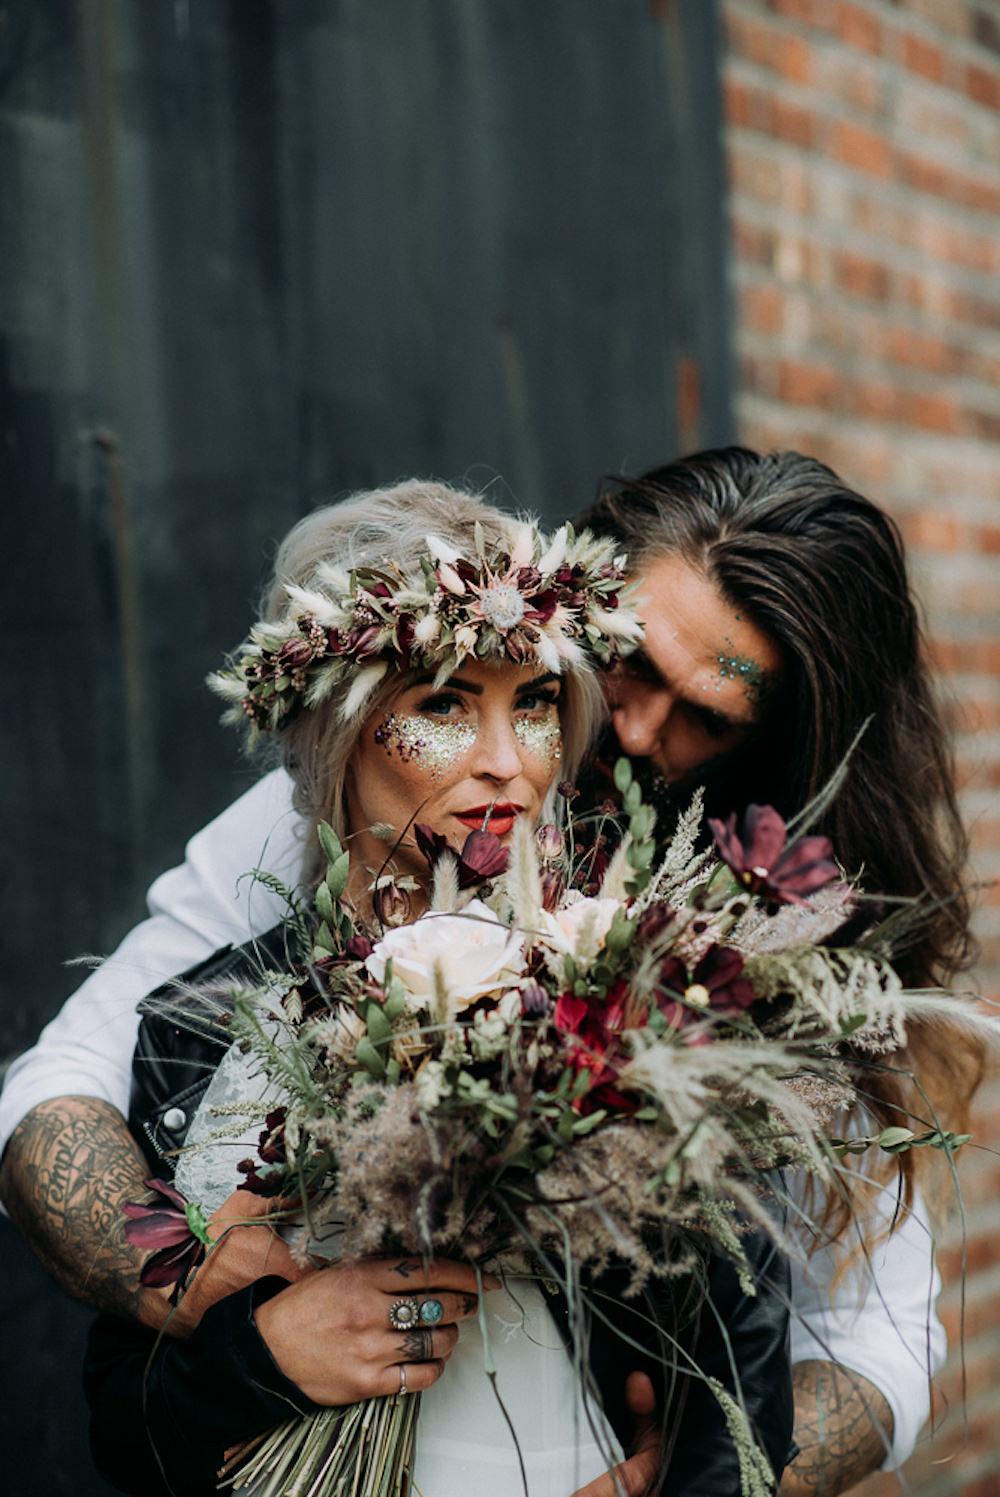 Glitter Make Up Bride Bridal Unconventional Wedding Ideas Pierra G Photography